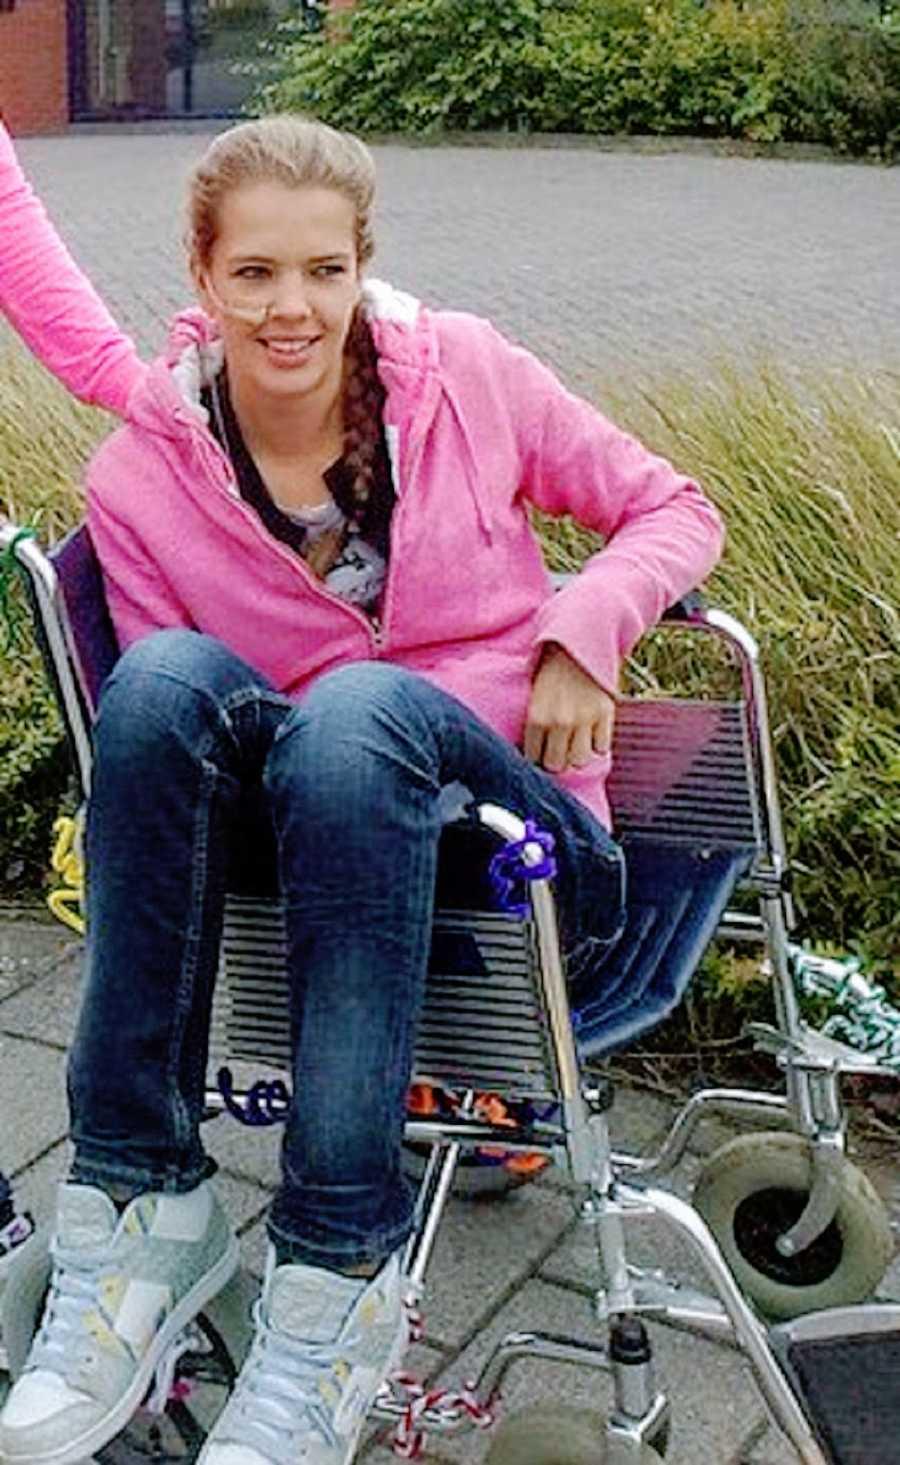 A person sits sideways in a wheelchair